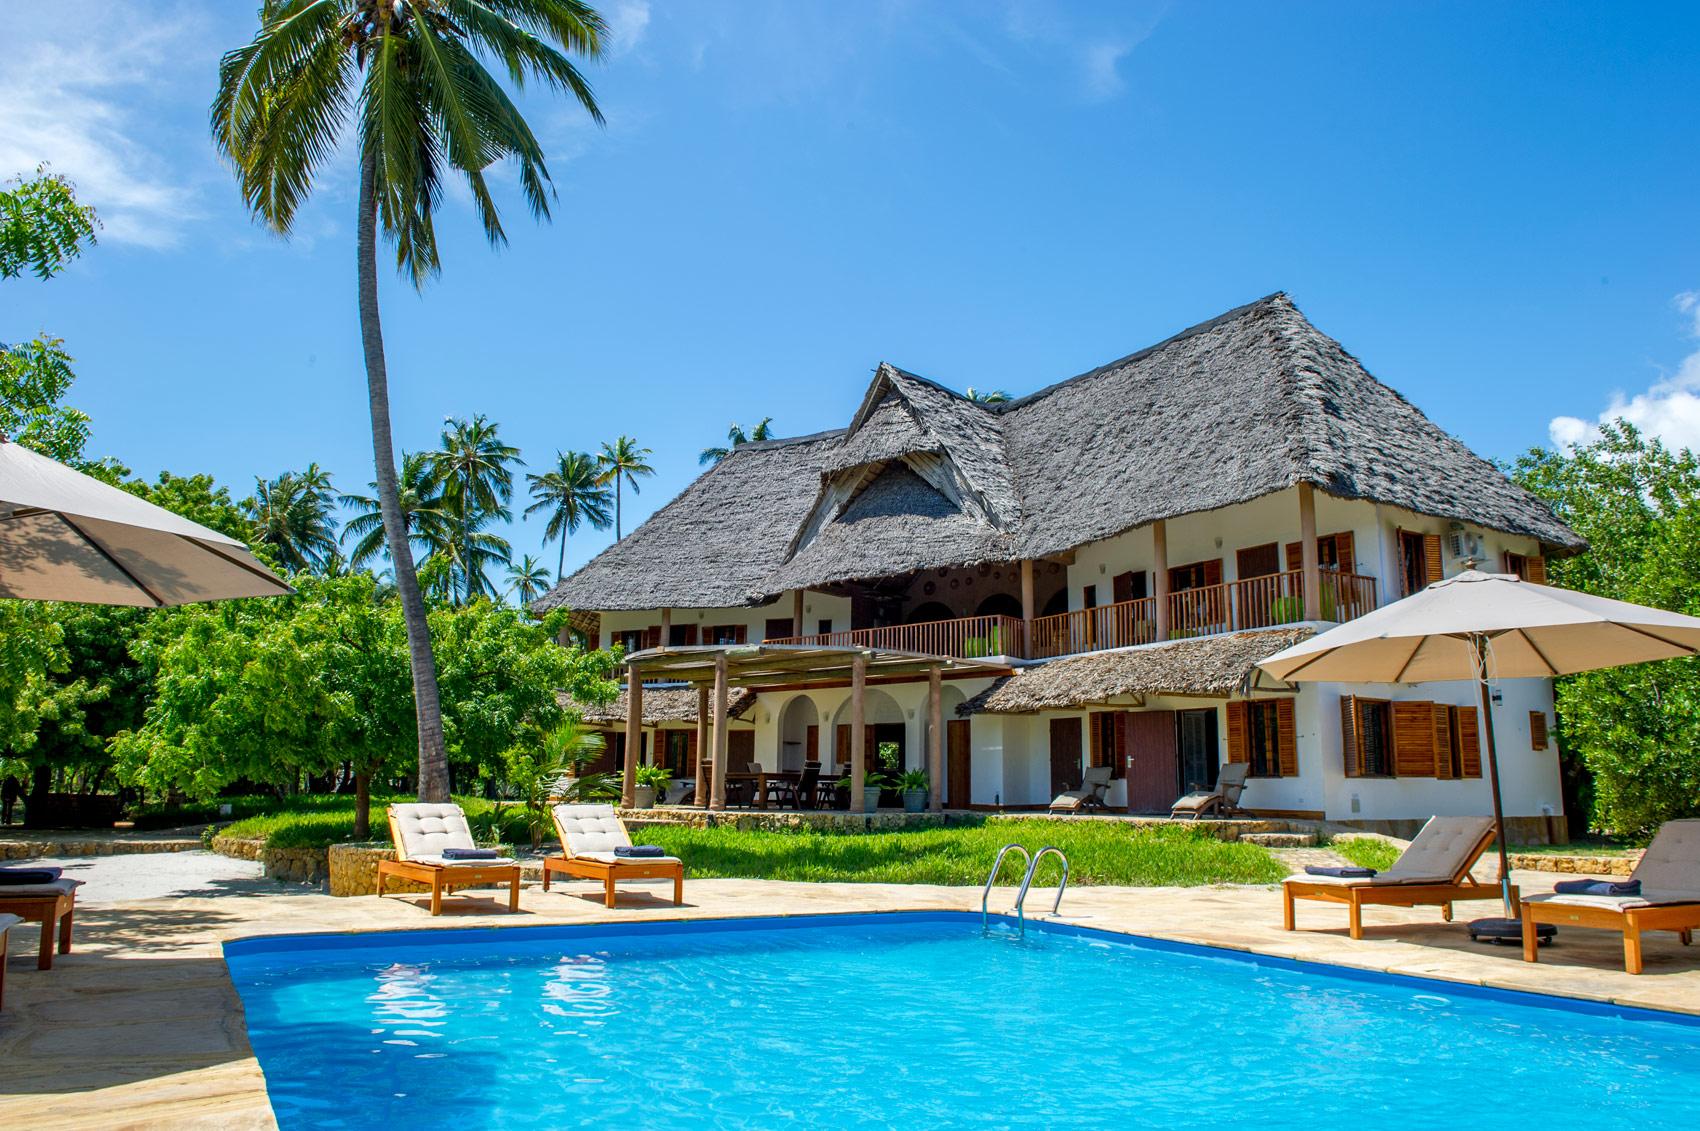 New Luxury Destinations For 2017: Mawimbi Villa, Tanzania